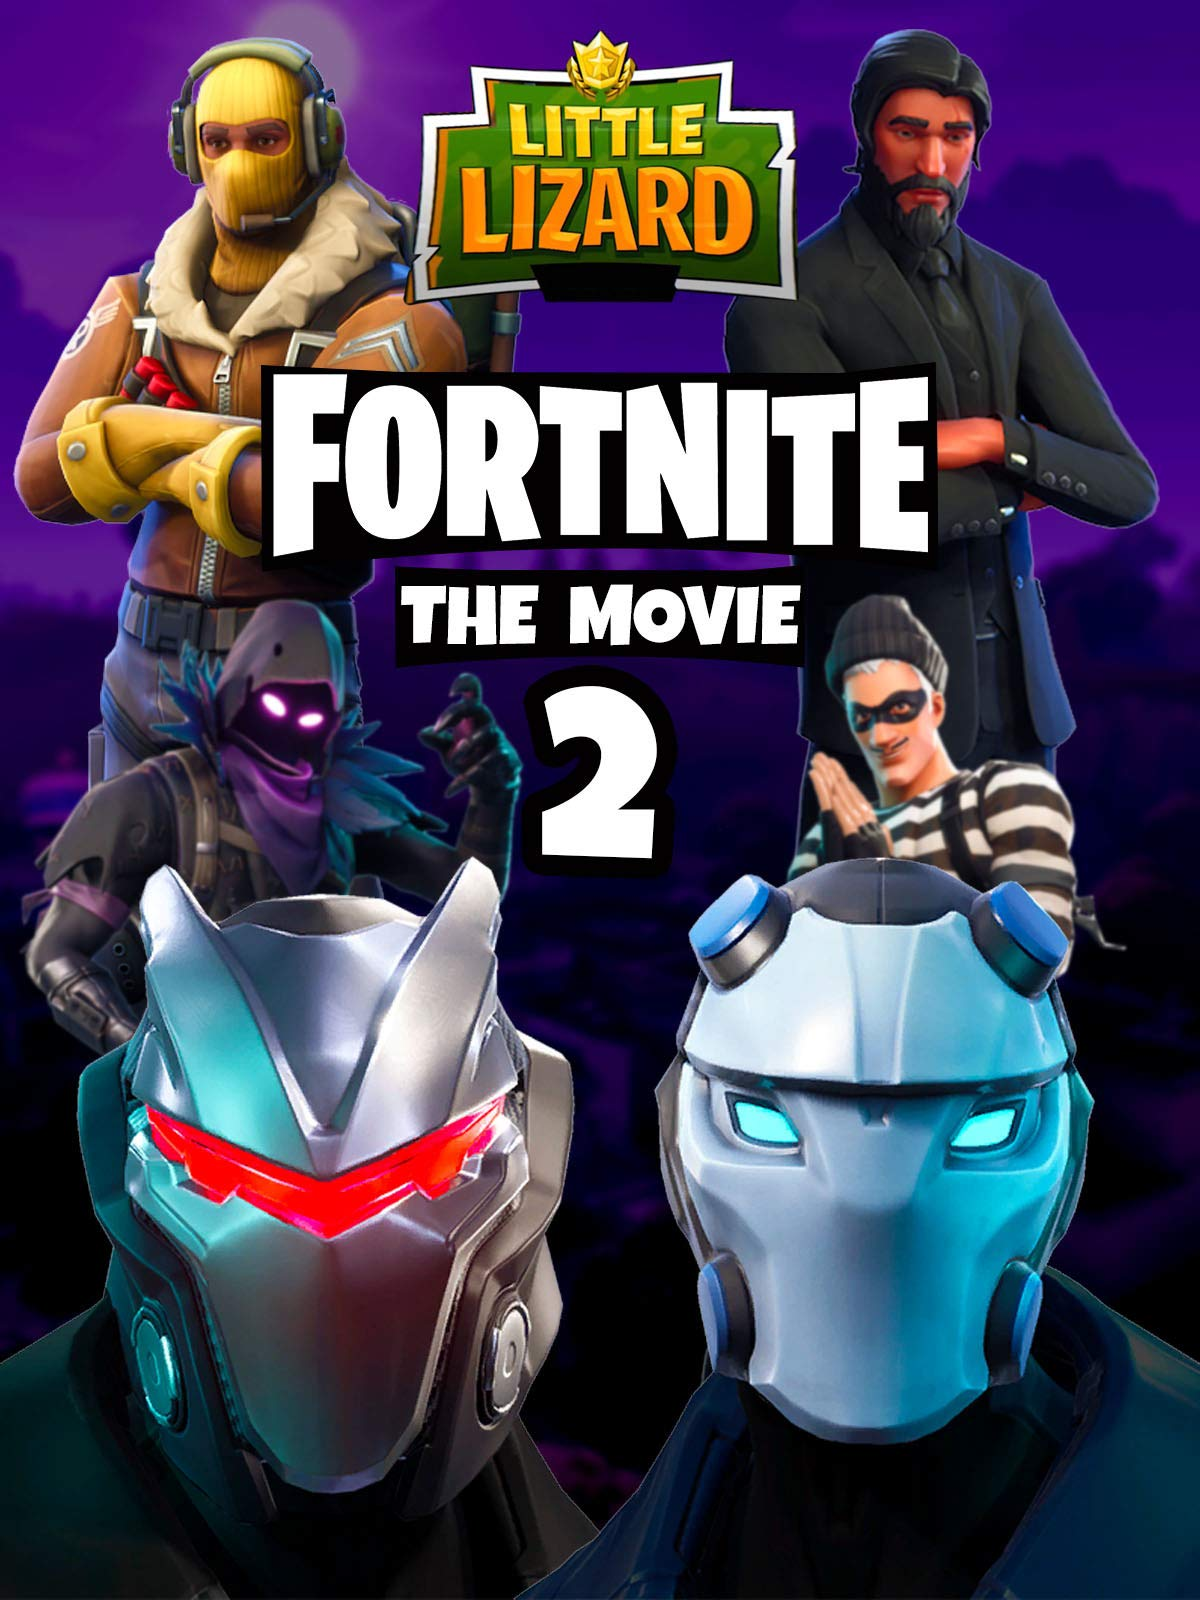 Clip: Little Lizard - Fortnite The Movie 2